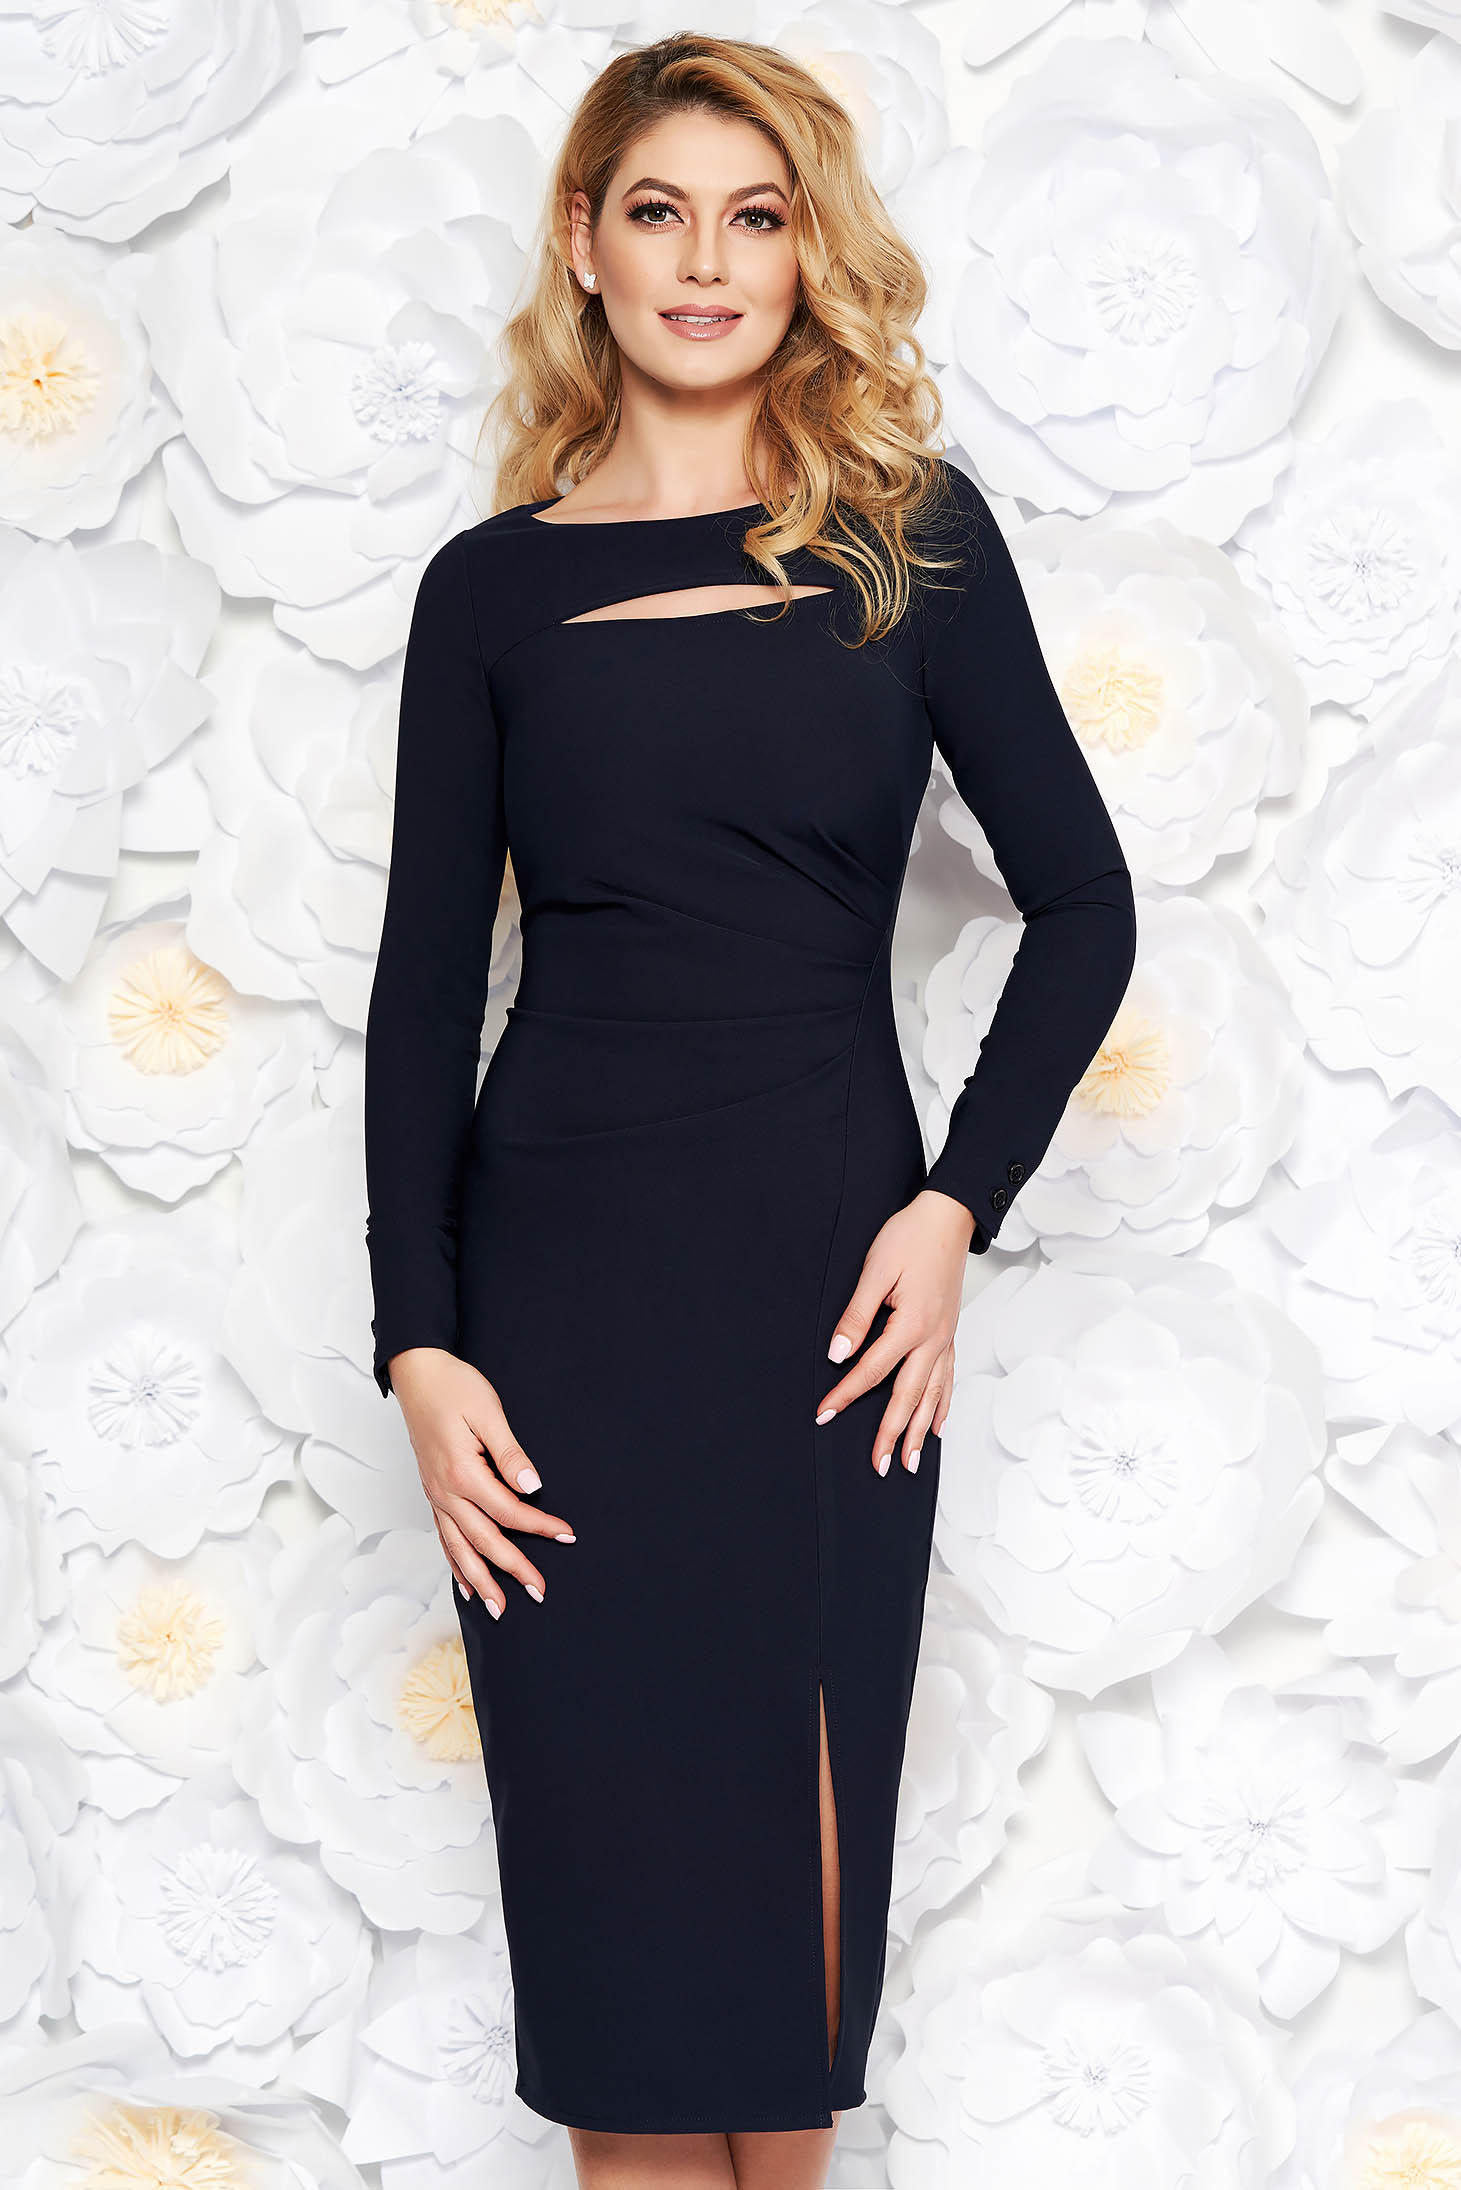 StarShinerS darkblue elegant midi pencil dress long sleeved from elastic fabric